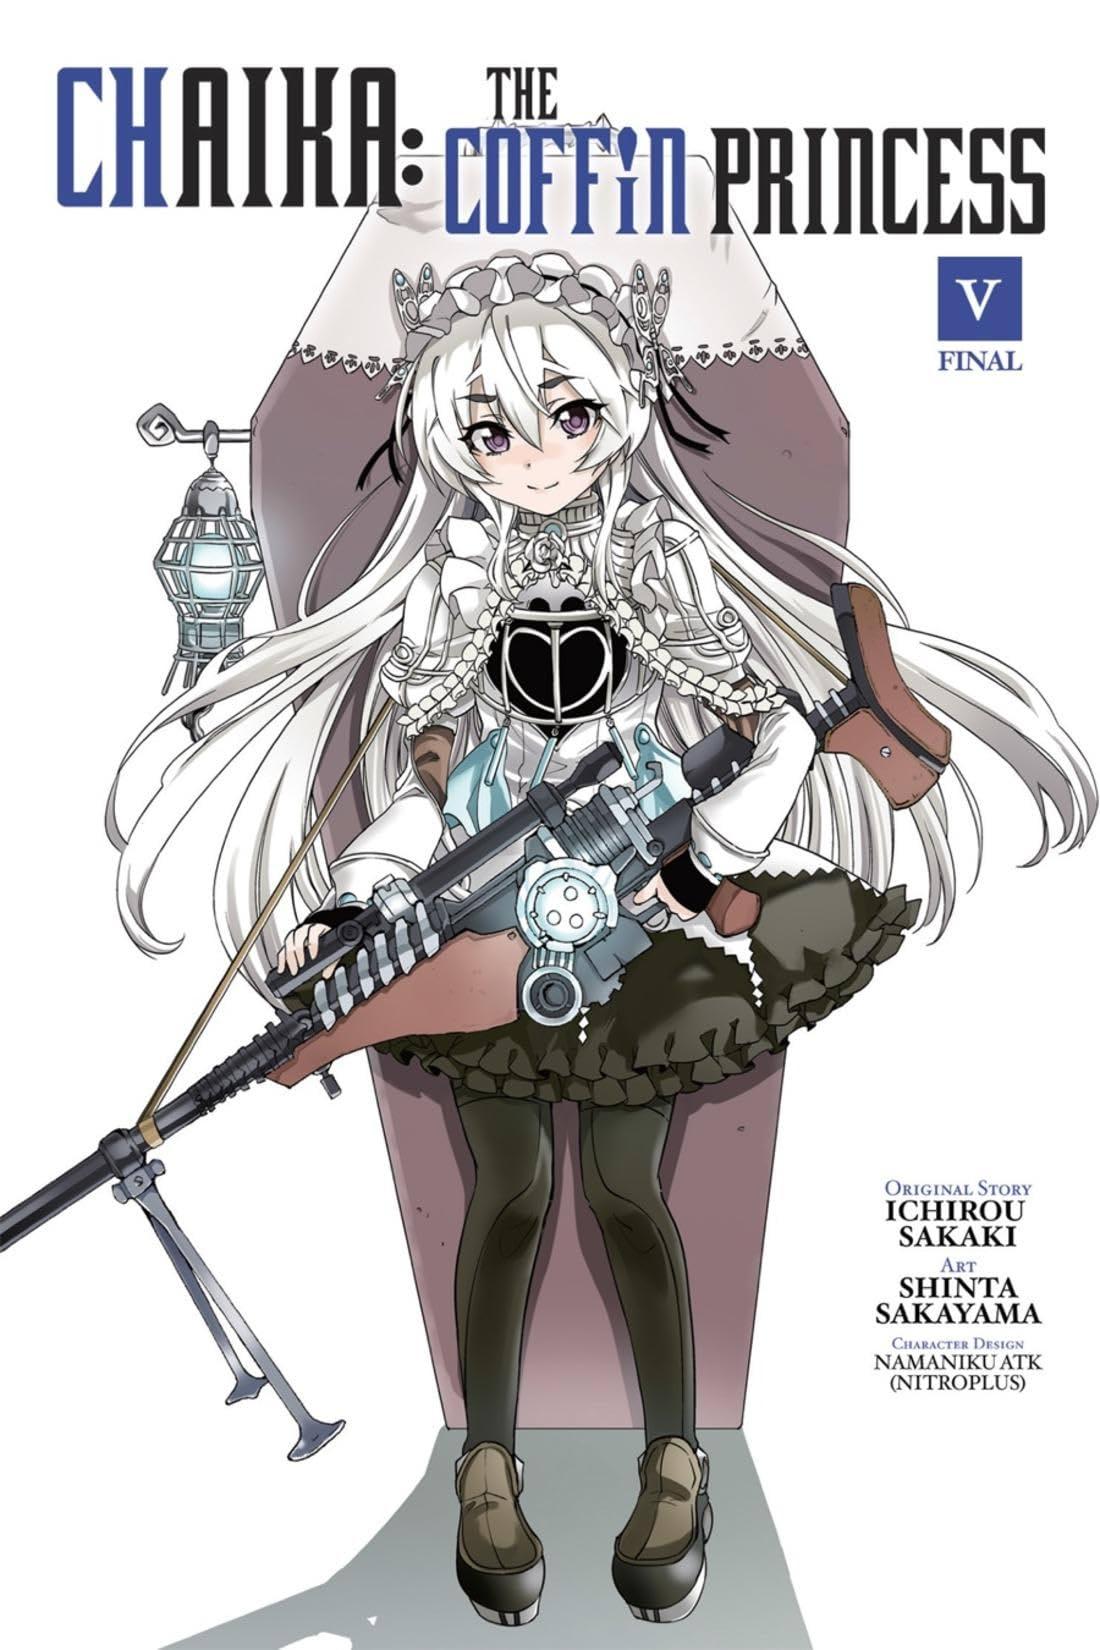 Chaika: The Coffin Princess Vol. 5